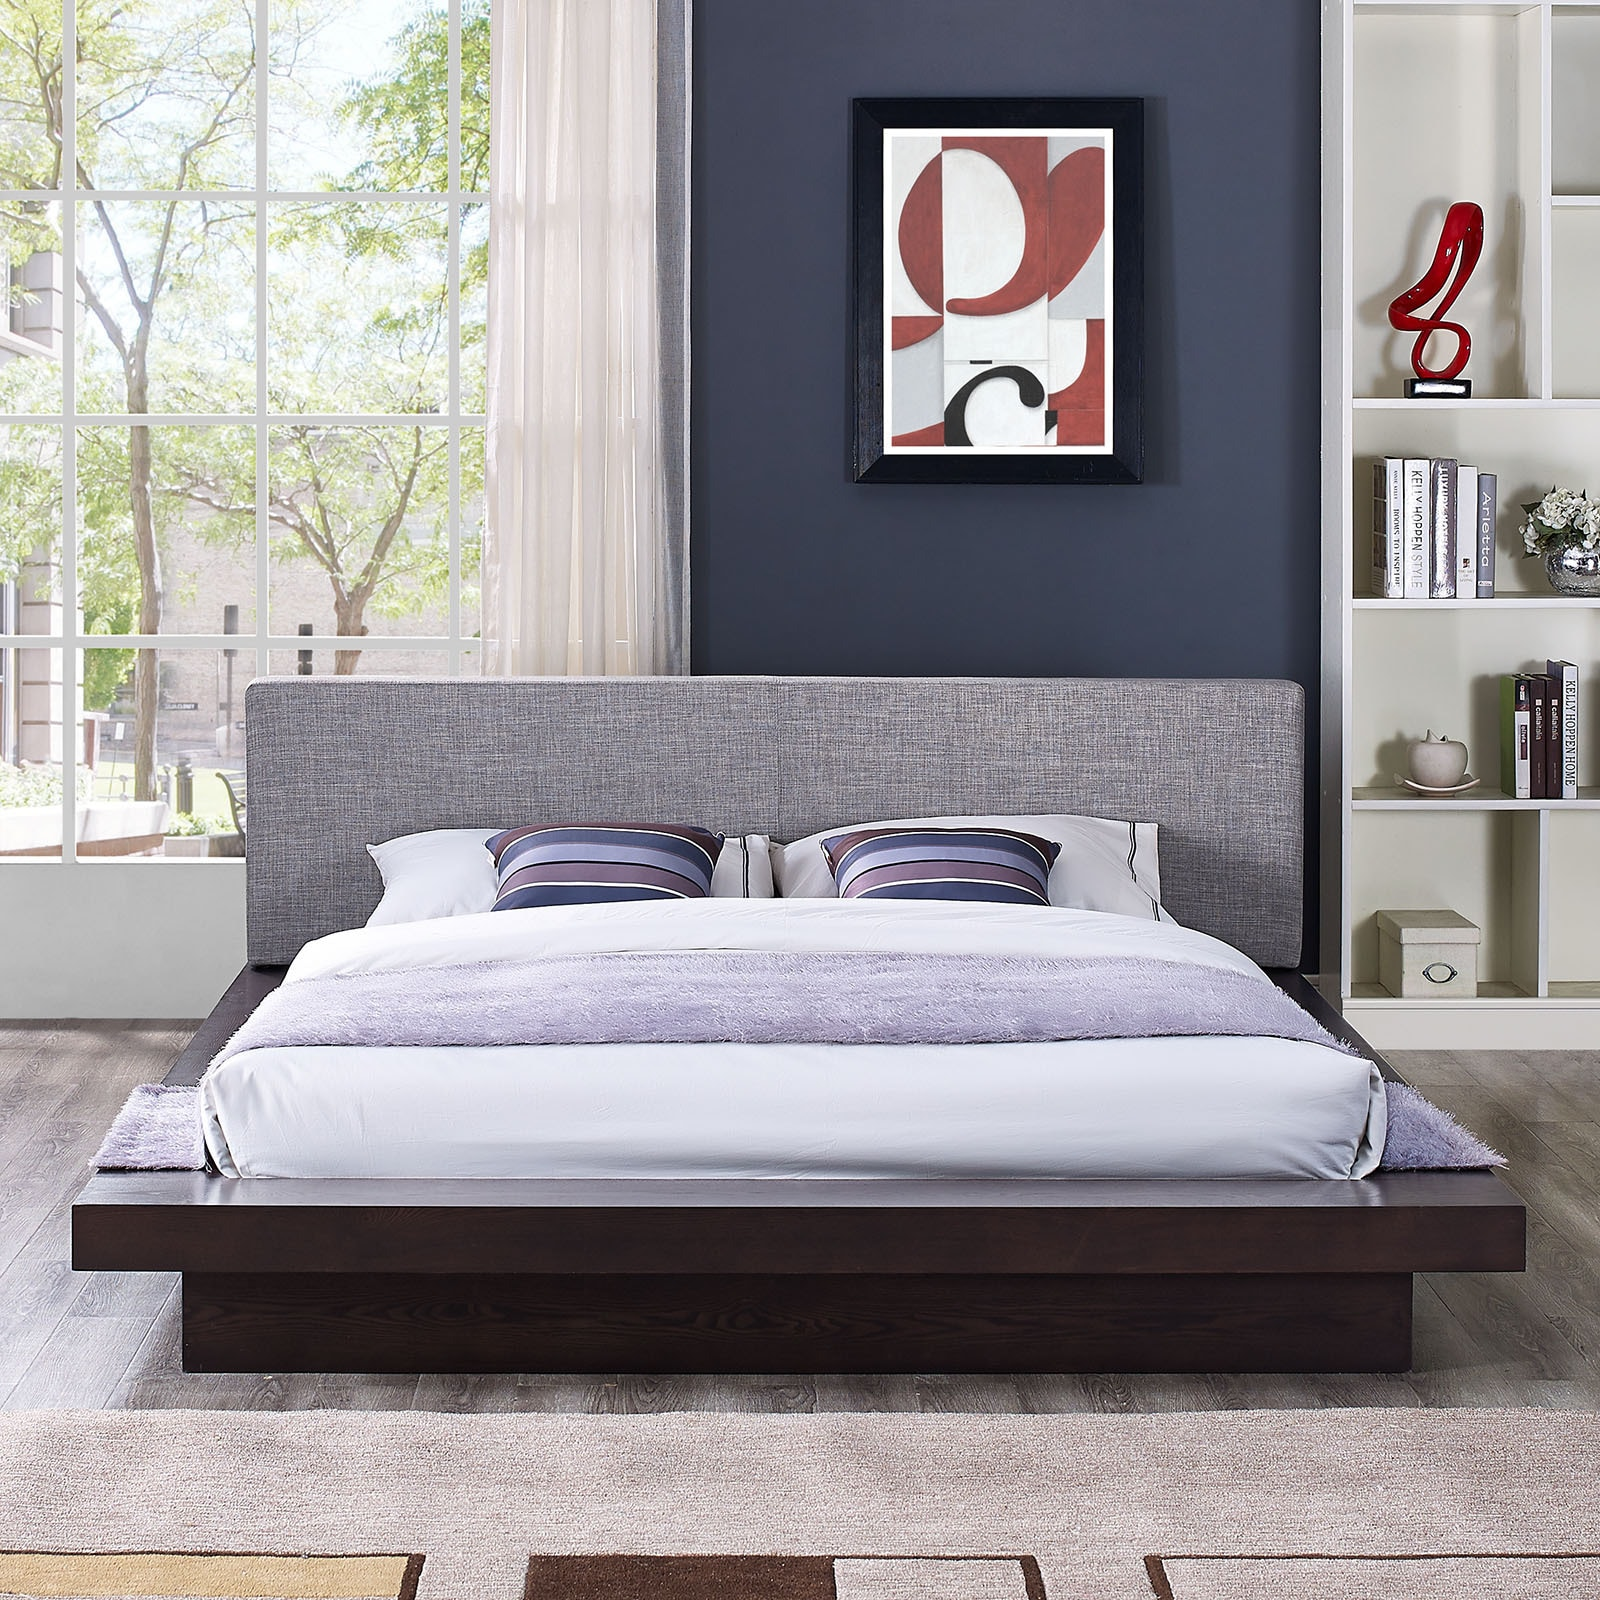 Freja Fabric Platform Queen-size Bed in Cappuccino Grey - Free ...